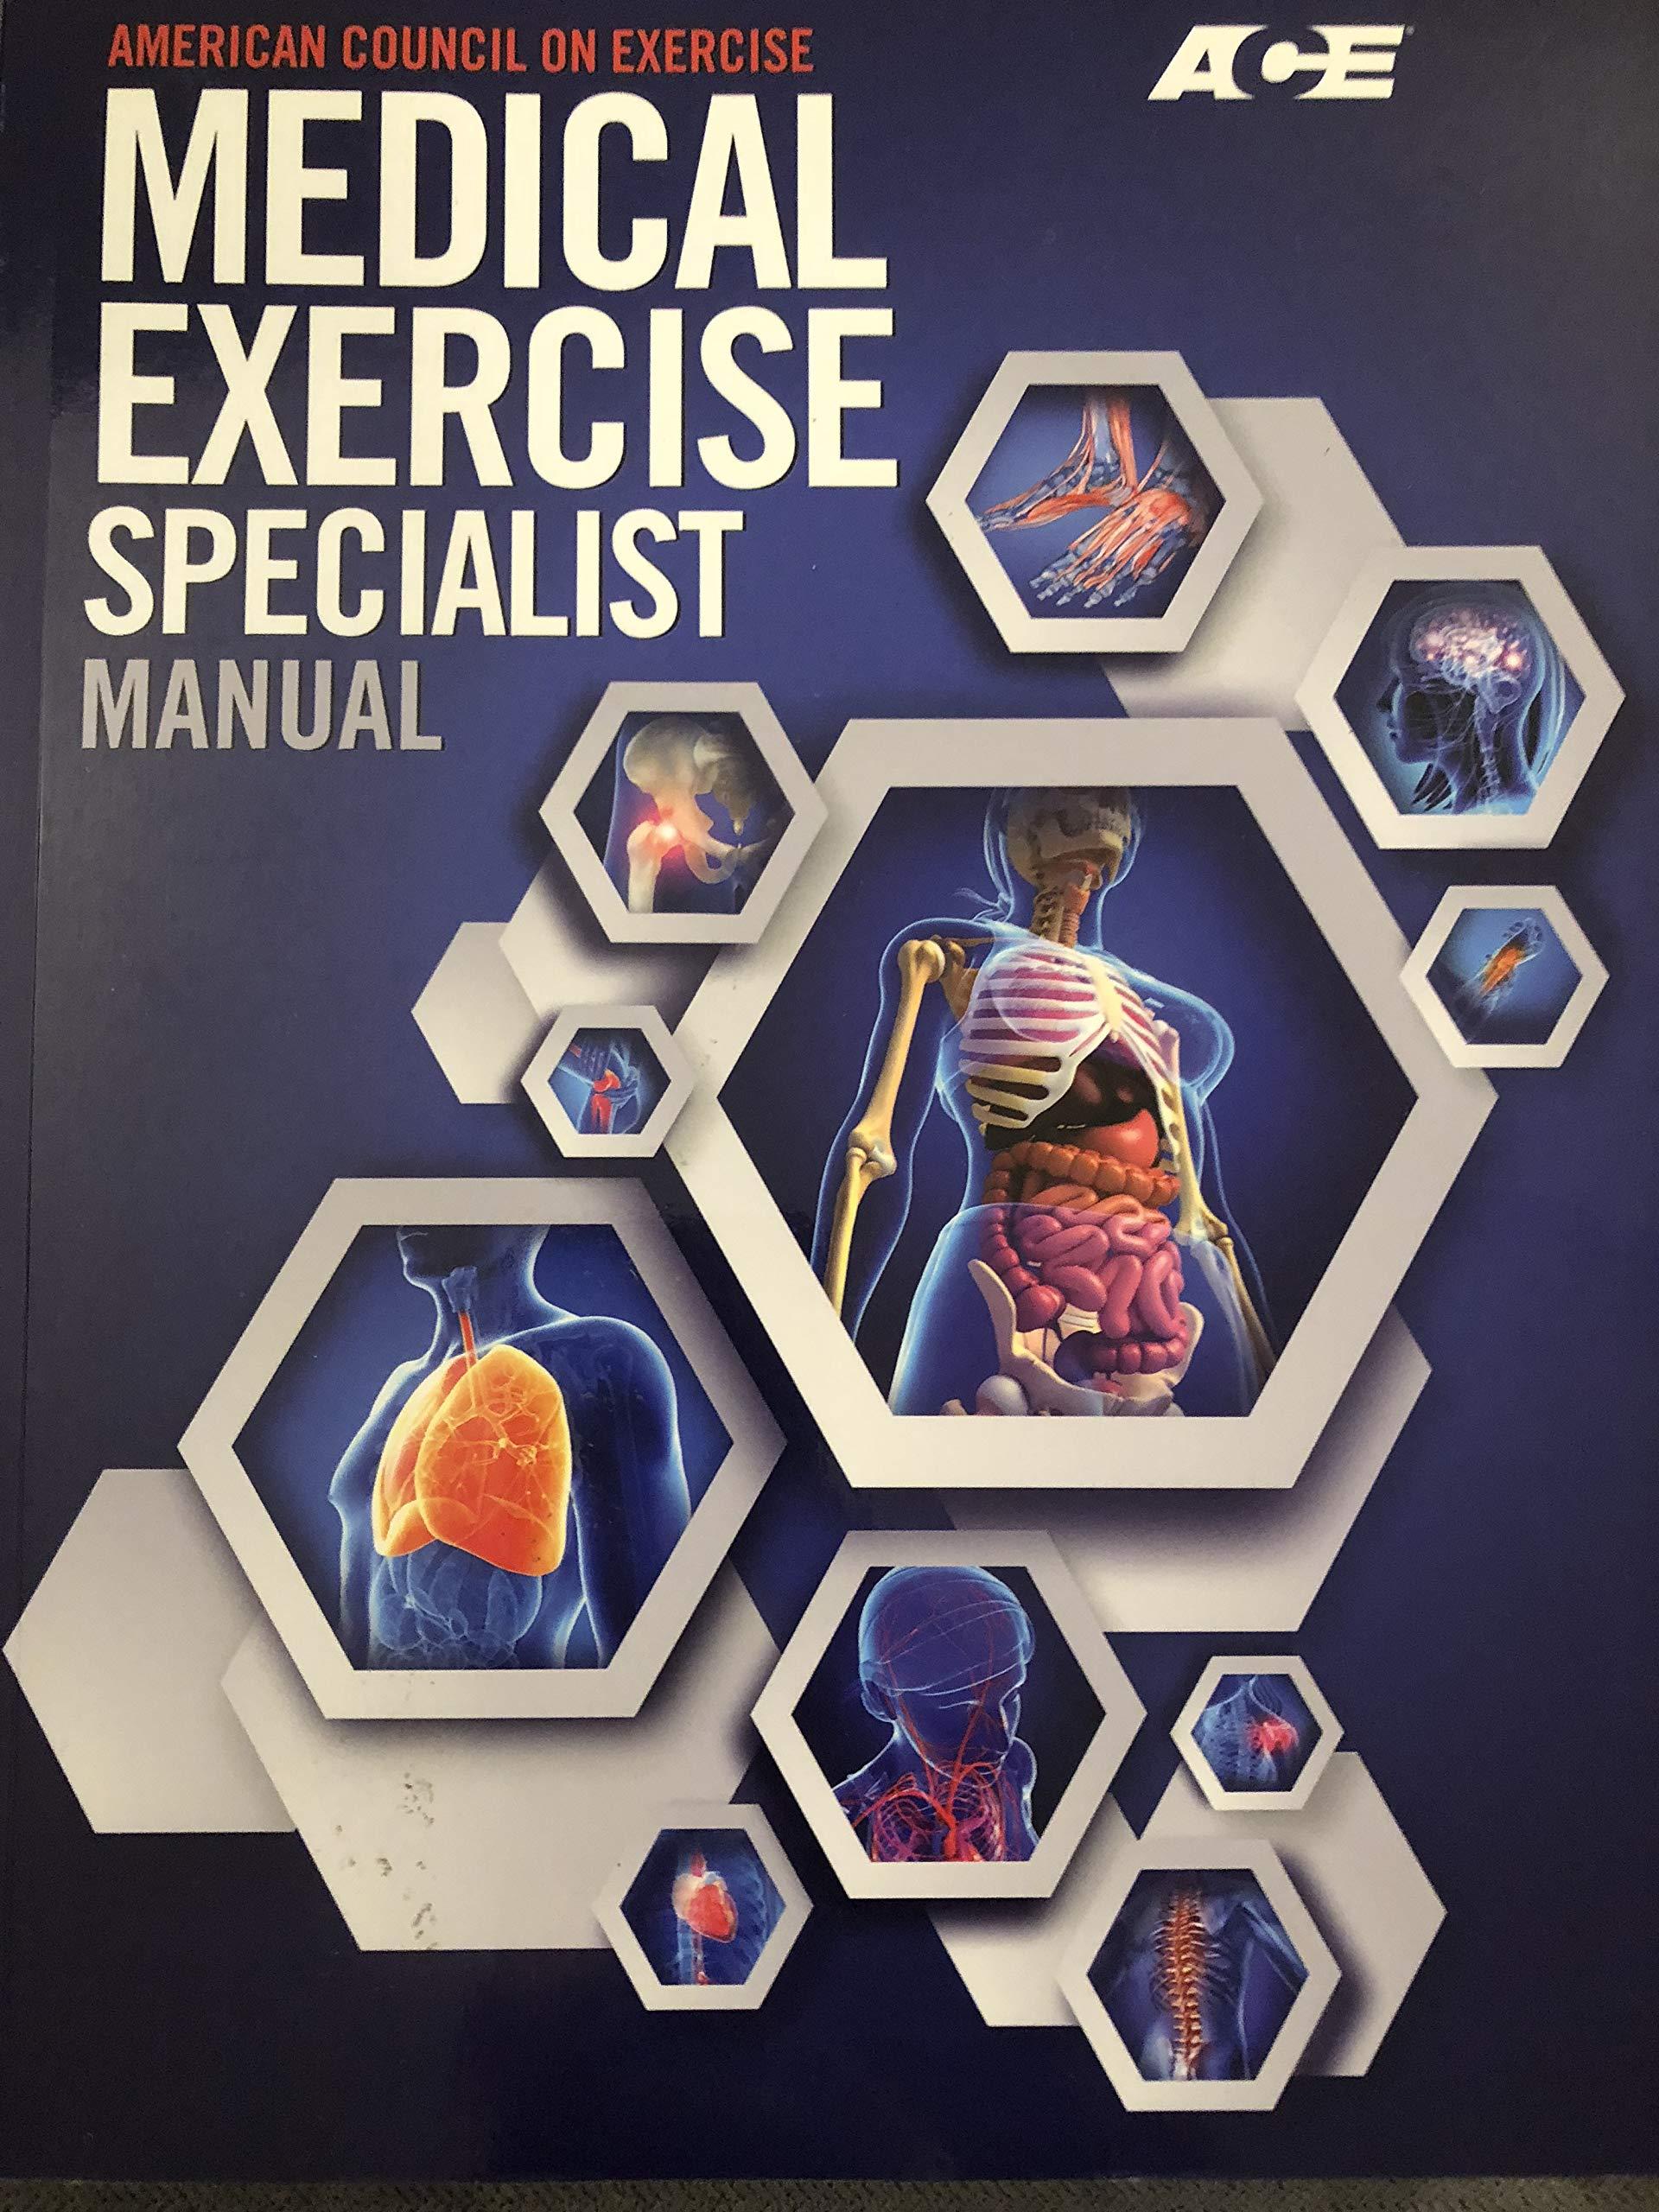 ACE Medical Exercise Specialist Manual: James S. Skinner, Cedric X. Bryant,  Sabrina Merrill: 9781890720520: Amazon.com: Books